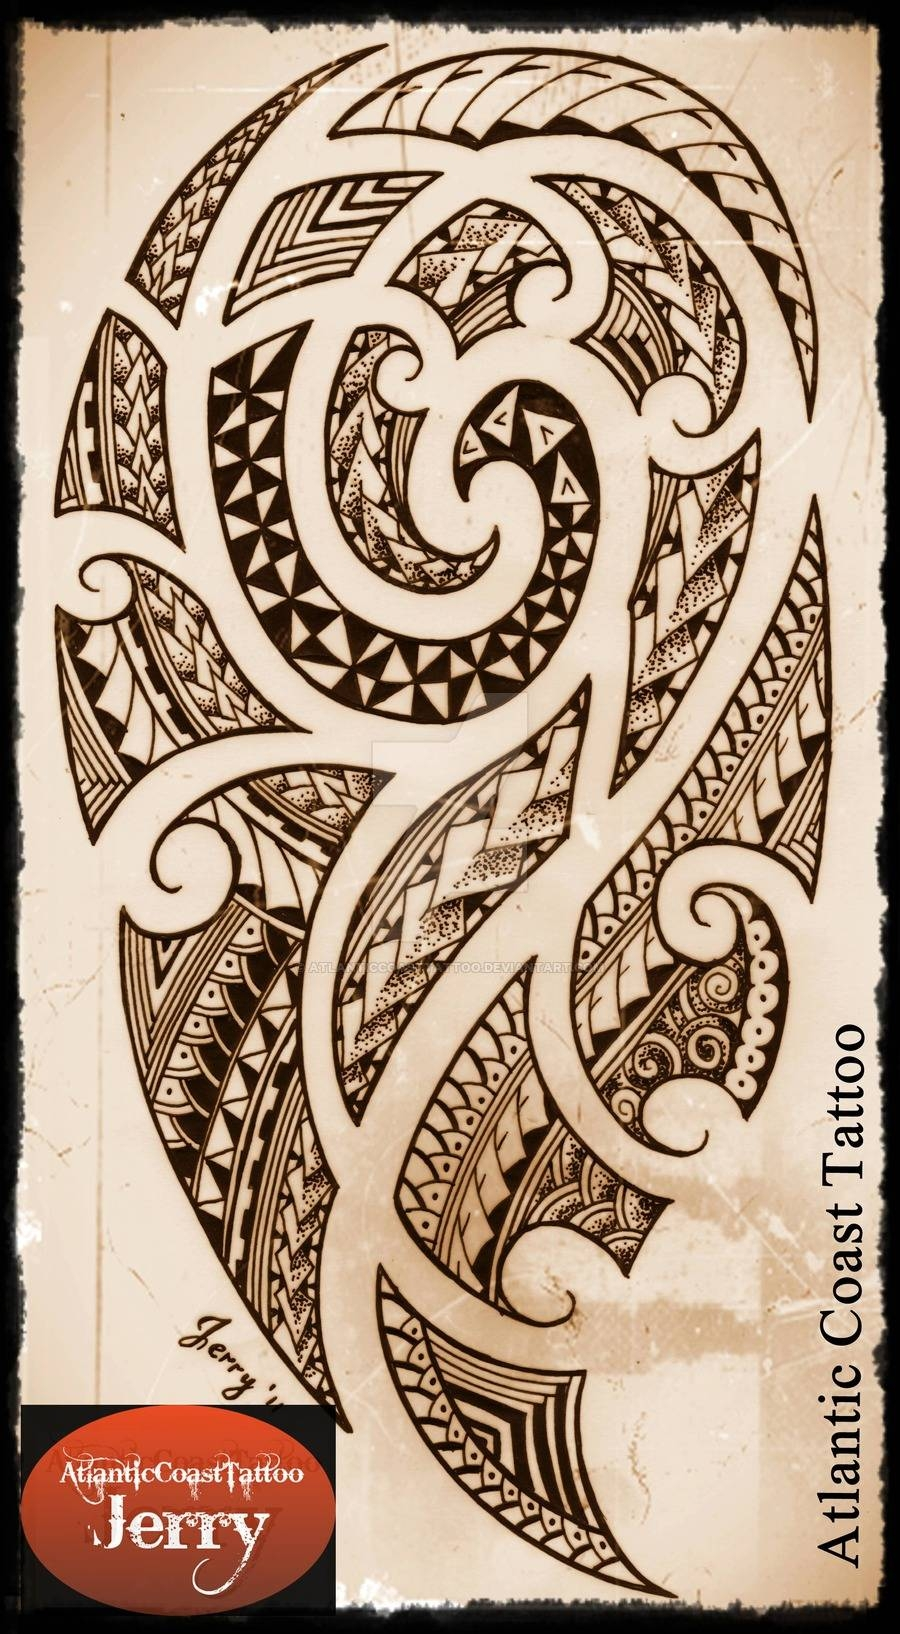 Polynesiantattoo | Explore Polynesiantattoo On Deviantart Inside Latest Polynesian Wall Art (View 13 of 20)